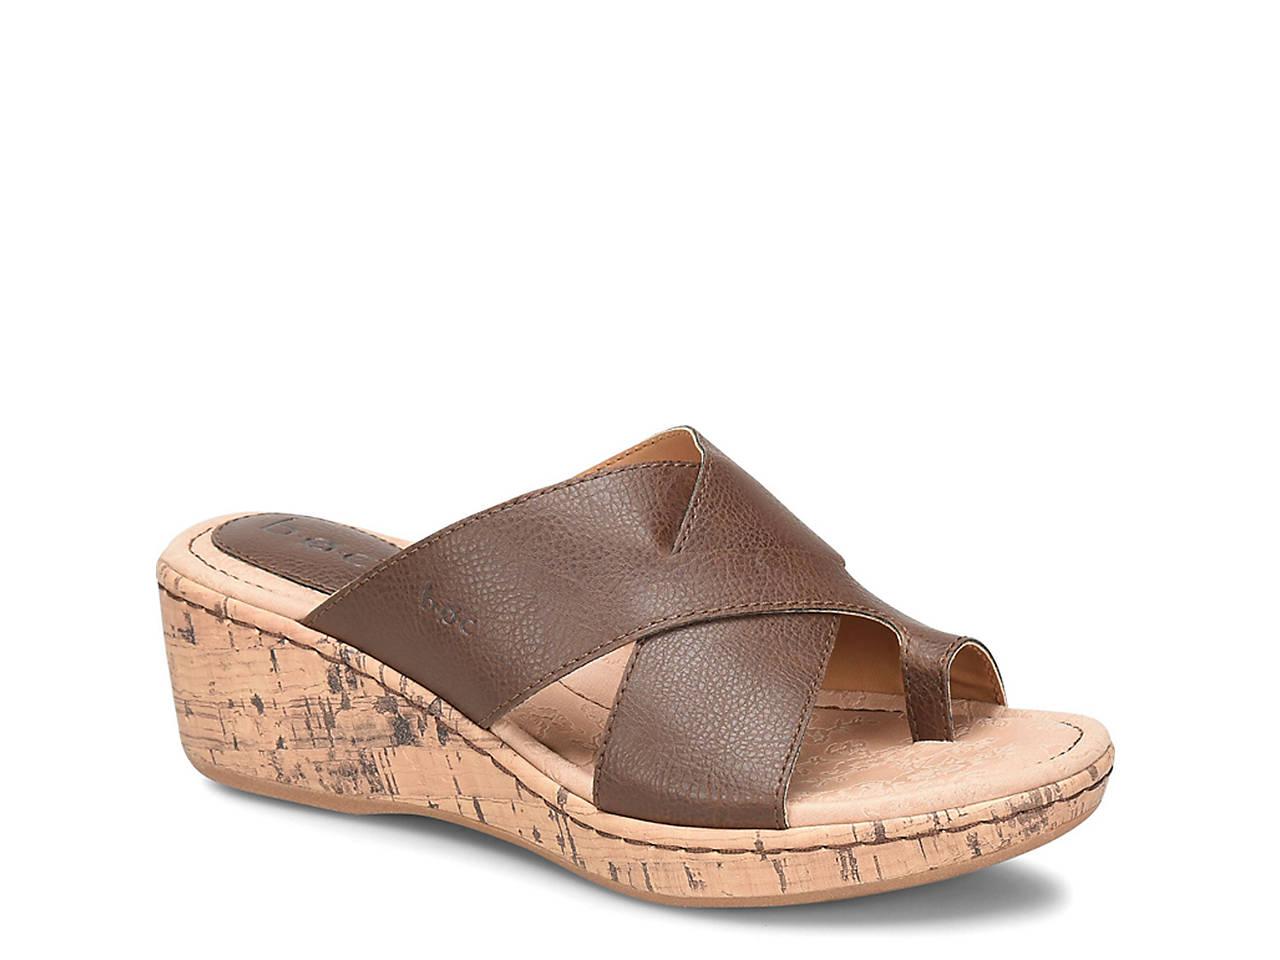 d37ec2234907 B O C Summer Wedge Sandal Women S Shoes Dsw